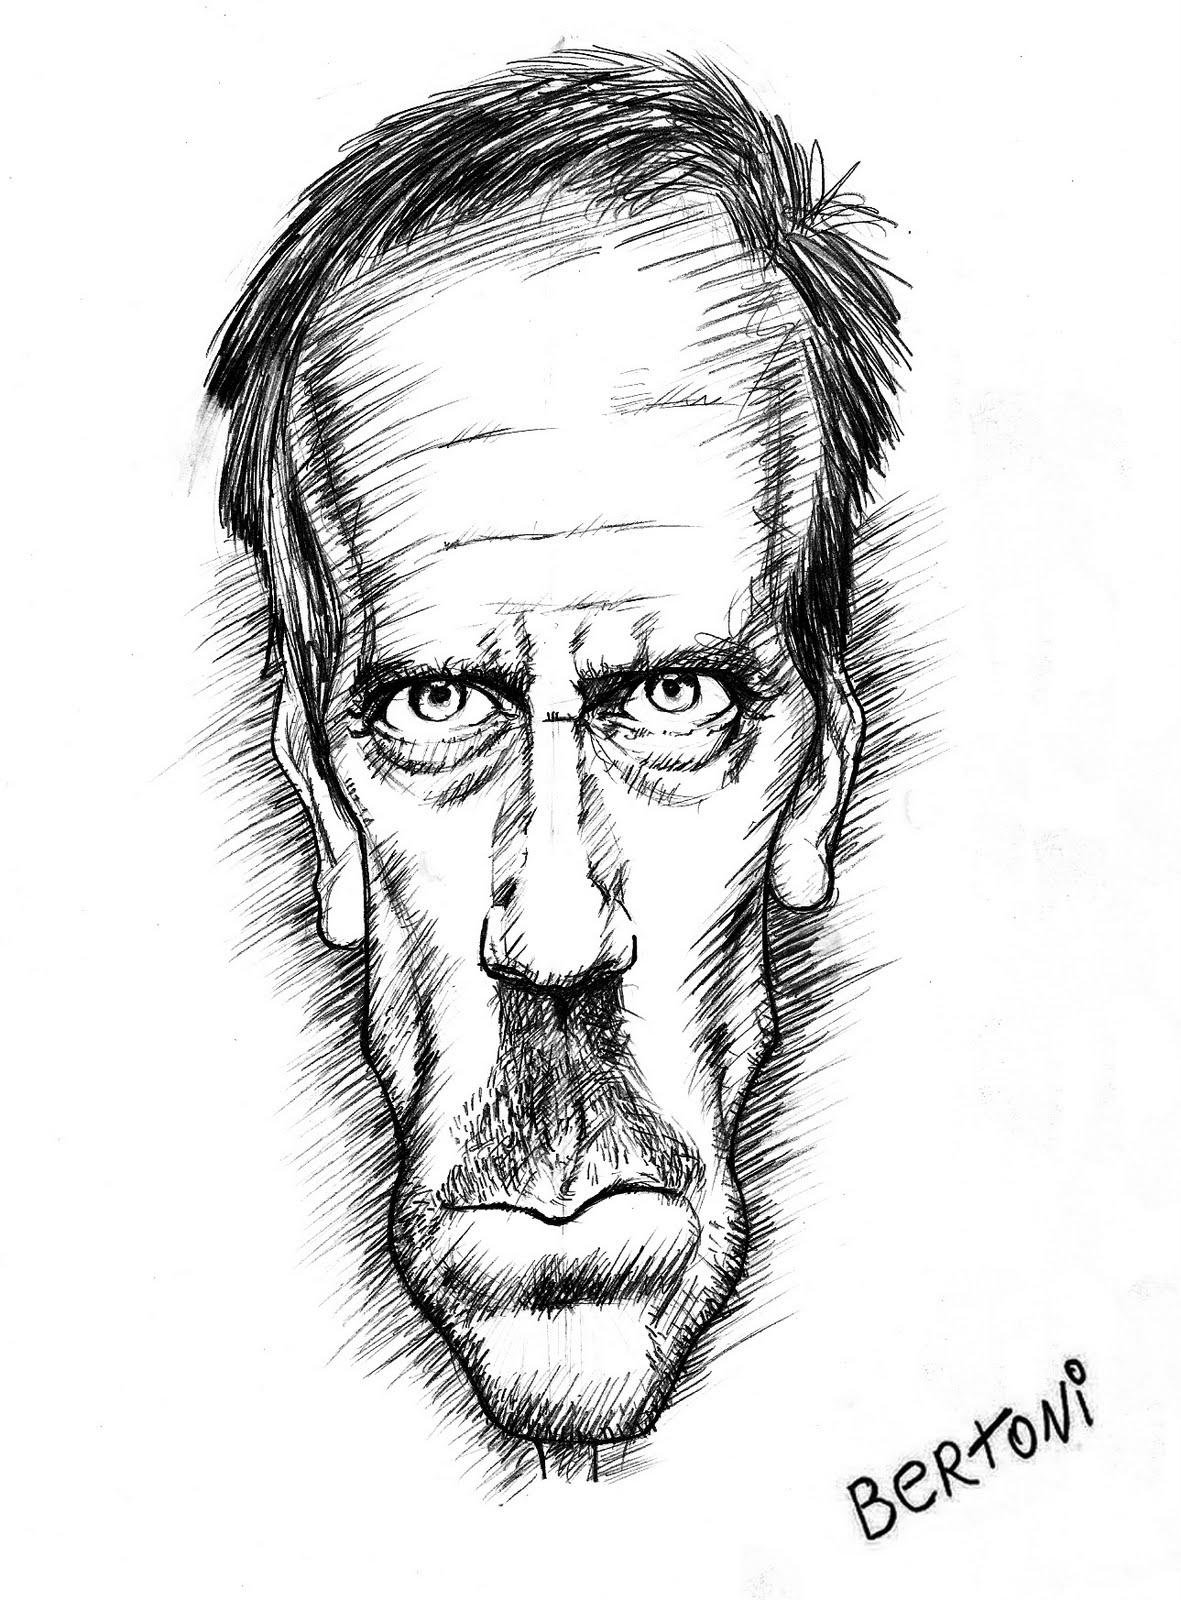 http://2.bp.blogspot.com/-Filjg3vKeXE/TrRLfeYOD2I/AAAAAAAAAI4/Ekz3pNB3QxU/s1600/thiago_bertoni_ituiutaba_dr_house_desenho.jpg